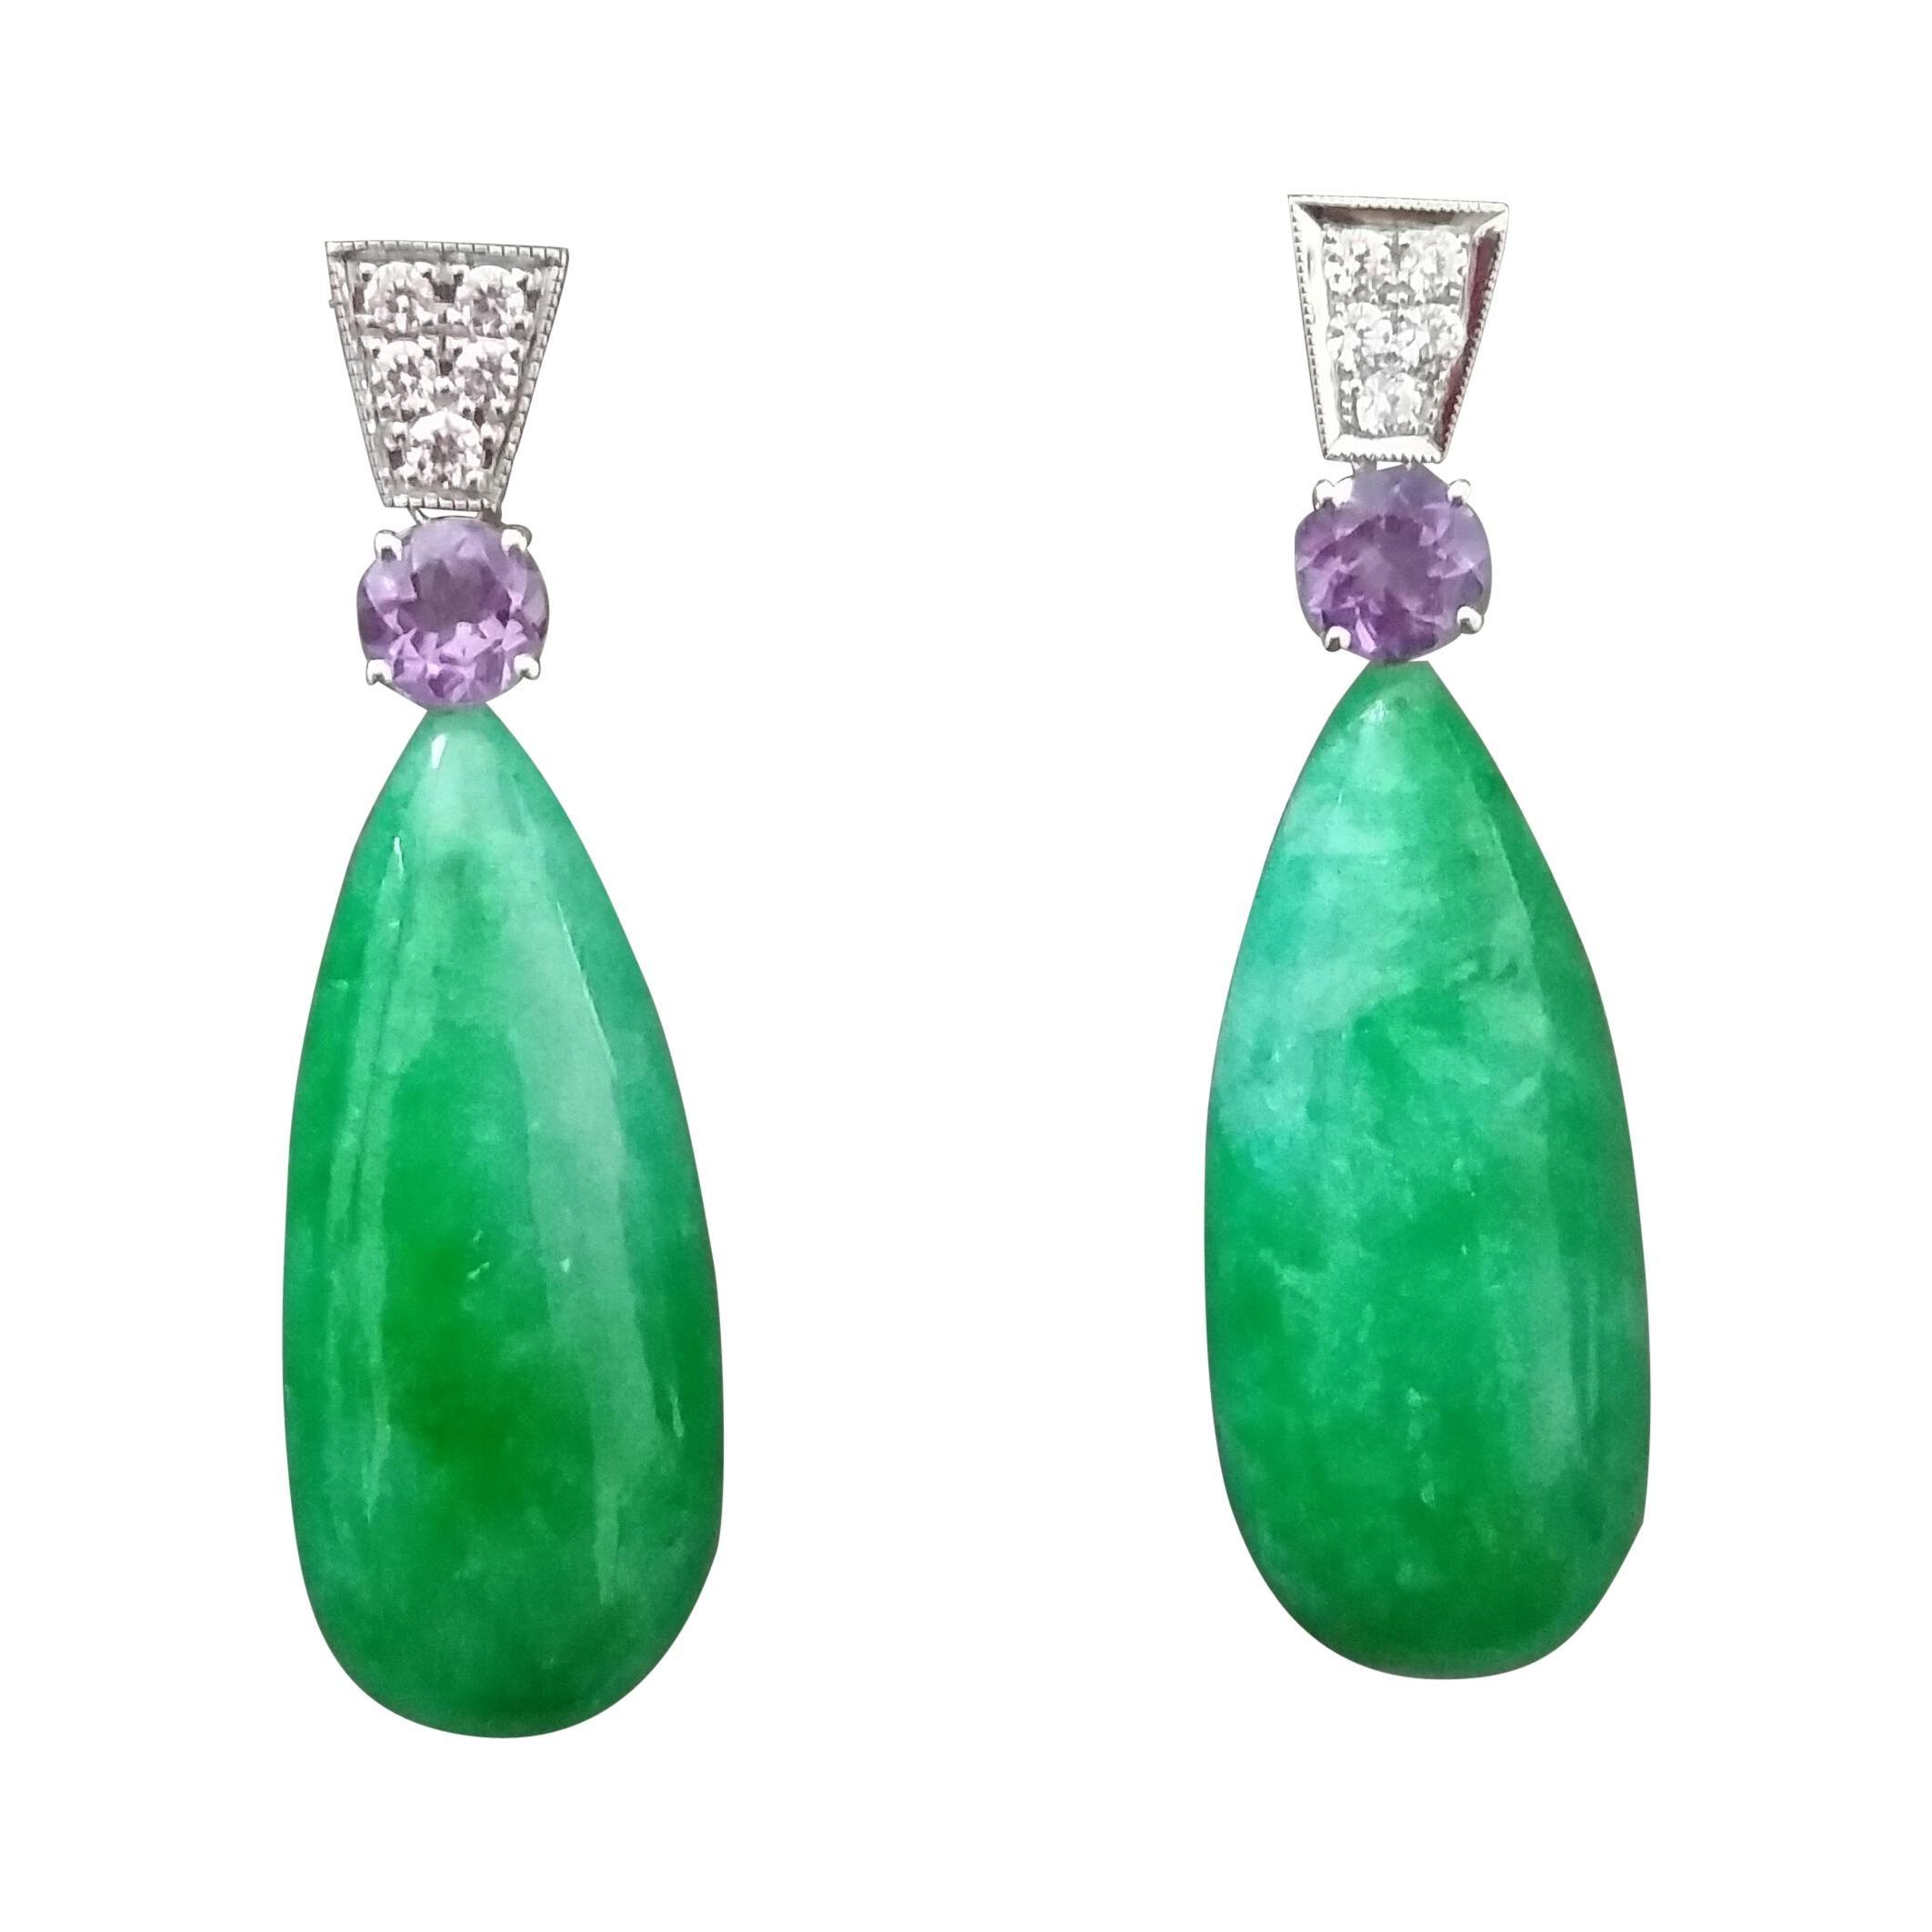 Art Deco Style Faceted Amethyst Diamonds 14 Kt White Gold Jade Drops Earrings